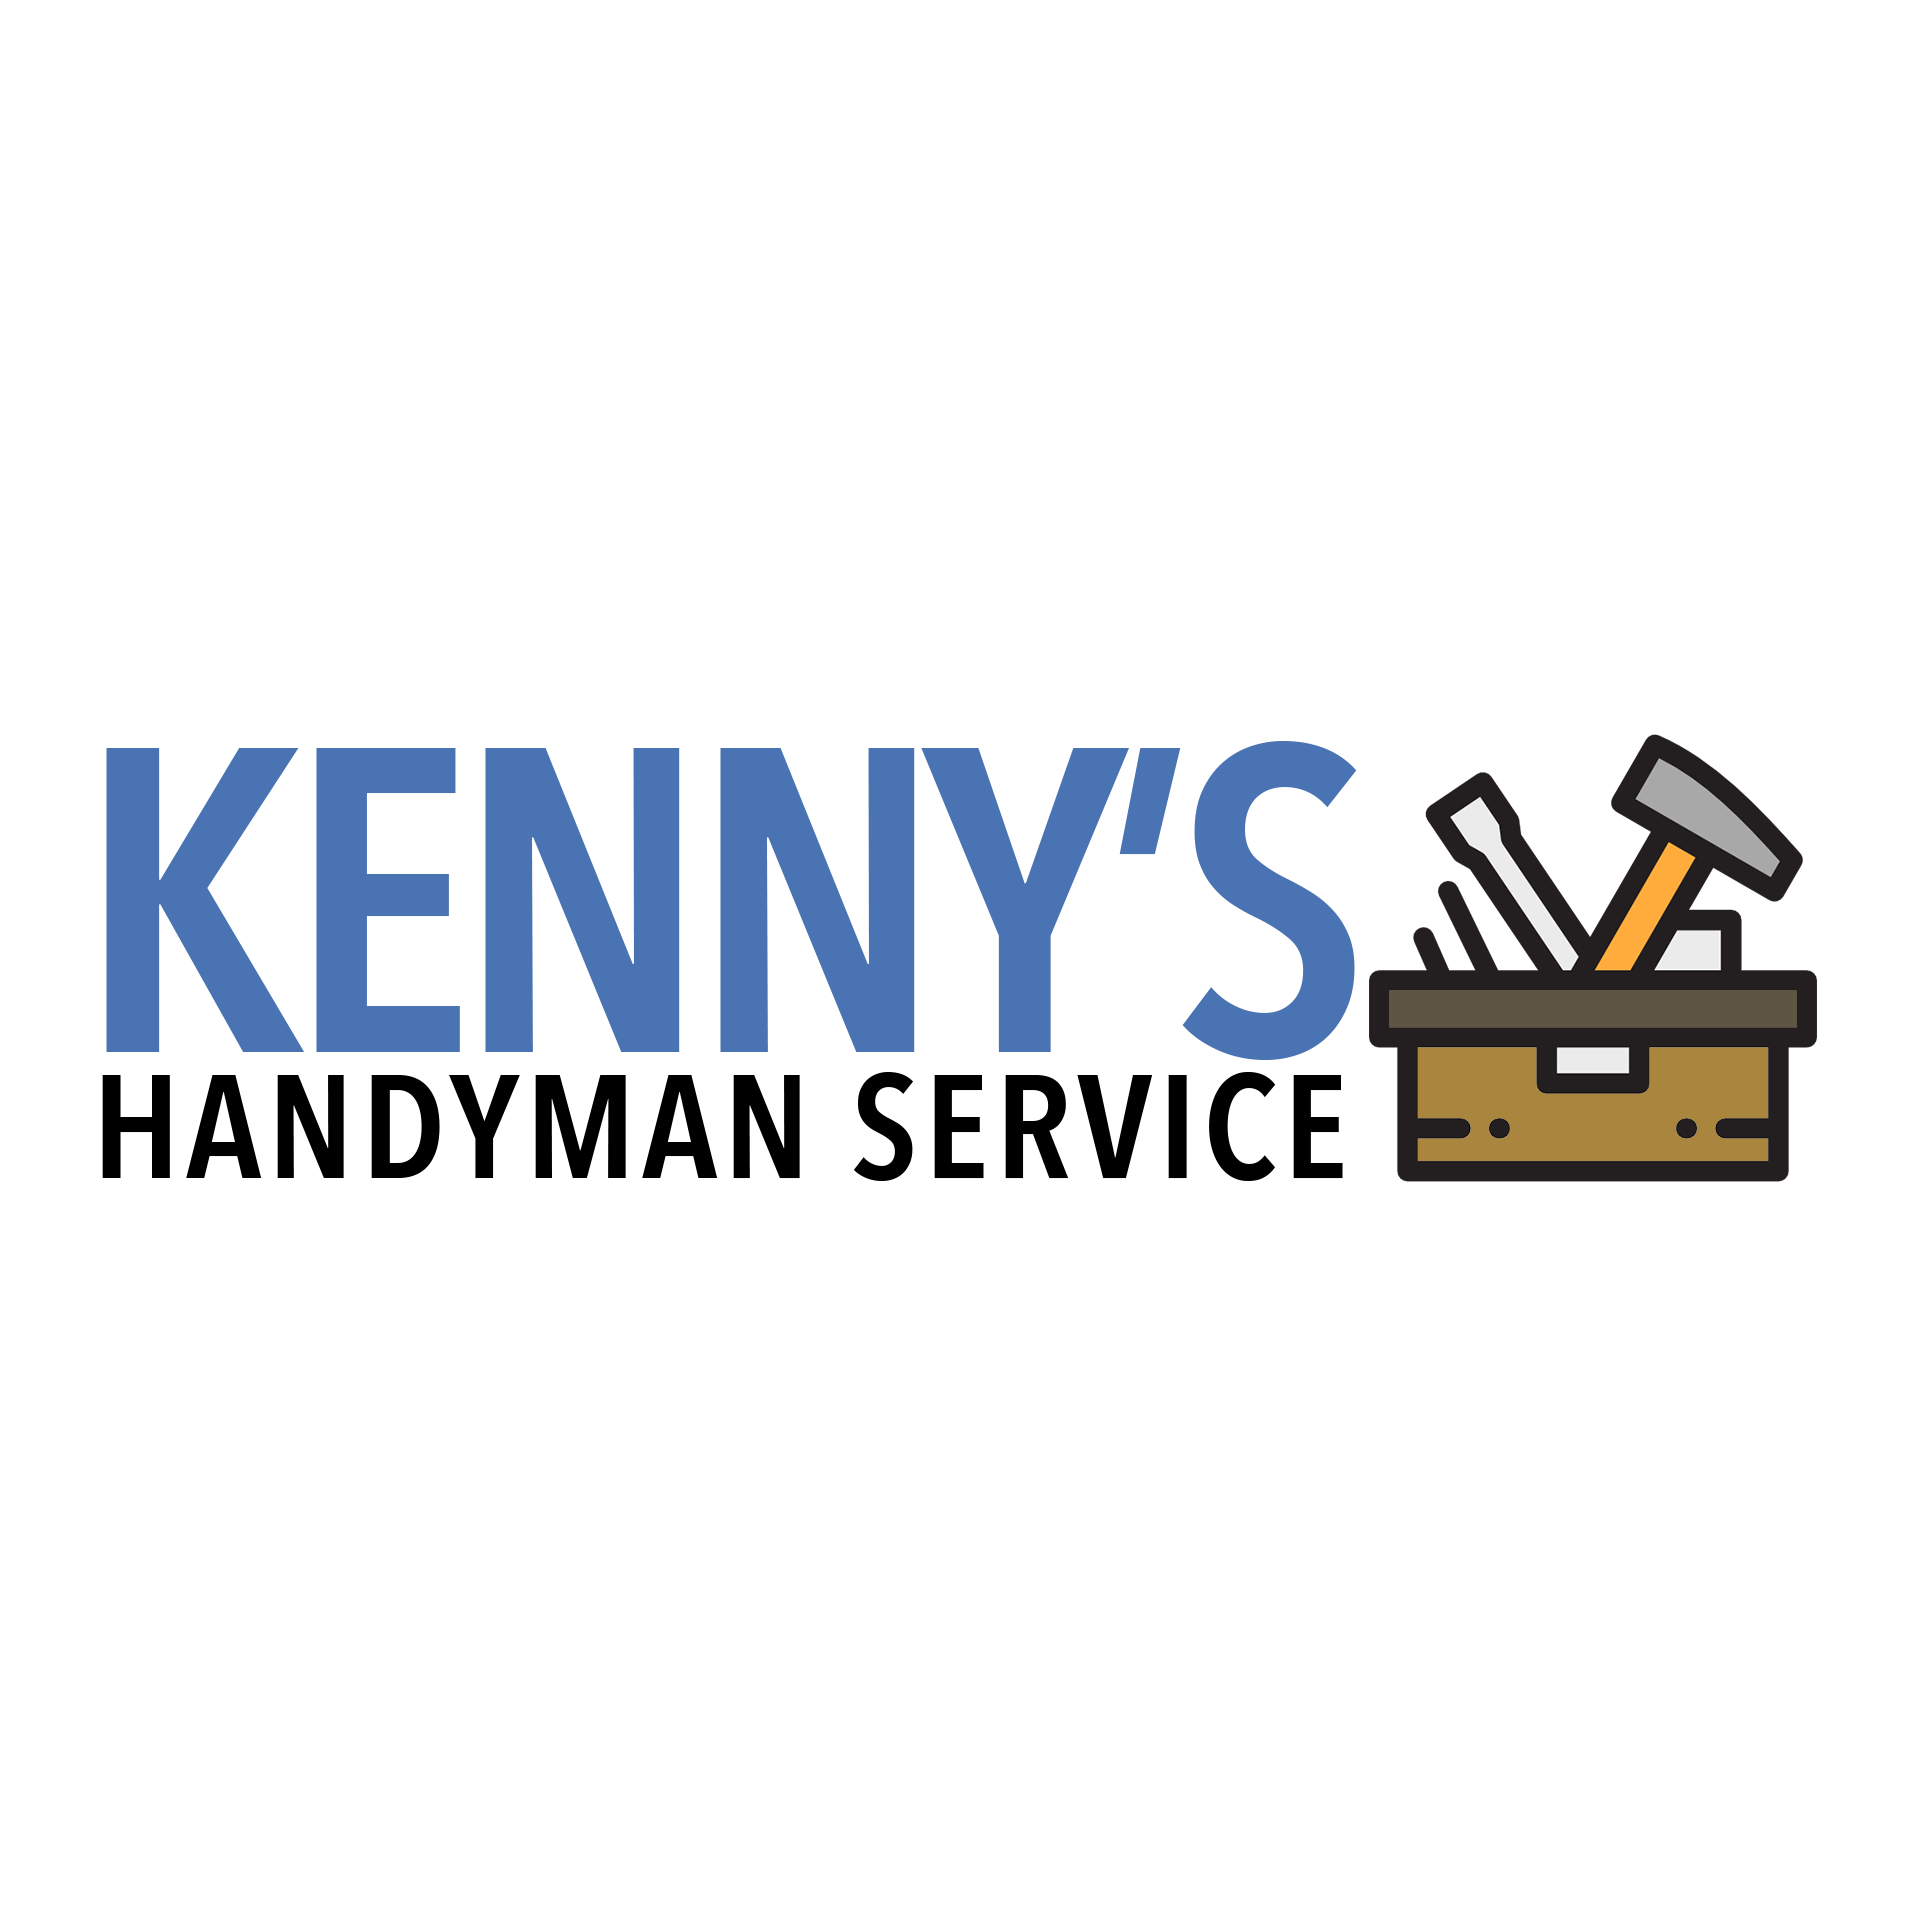 Kenny's Handyman Service